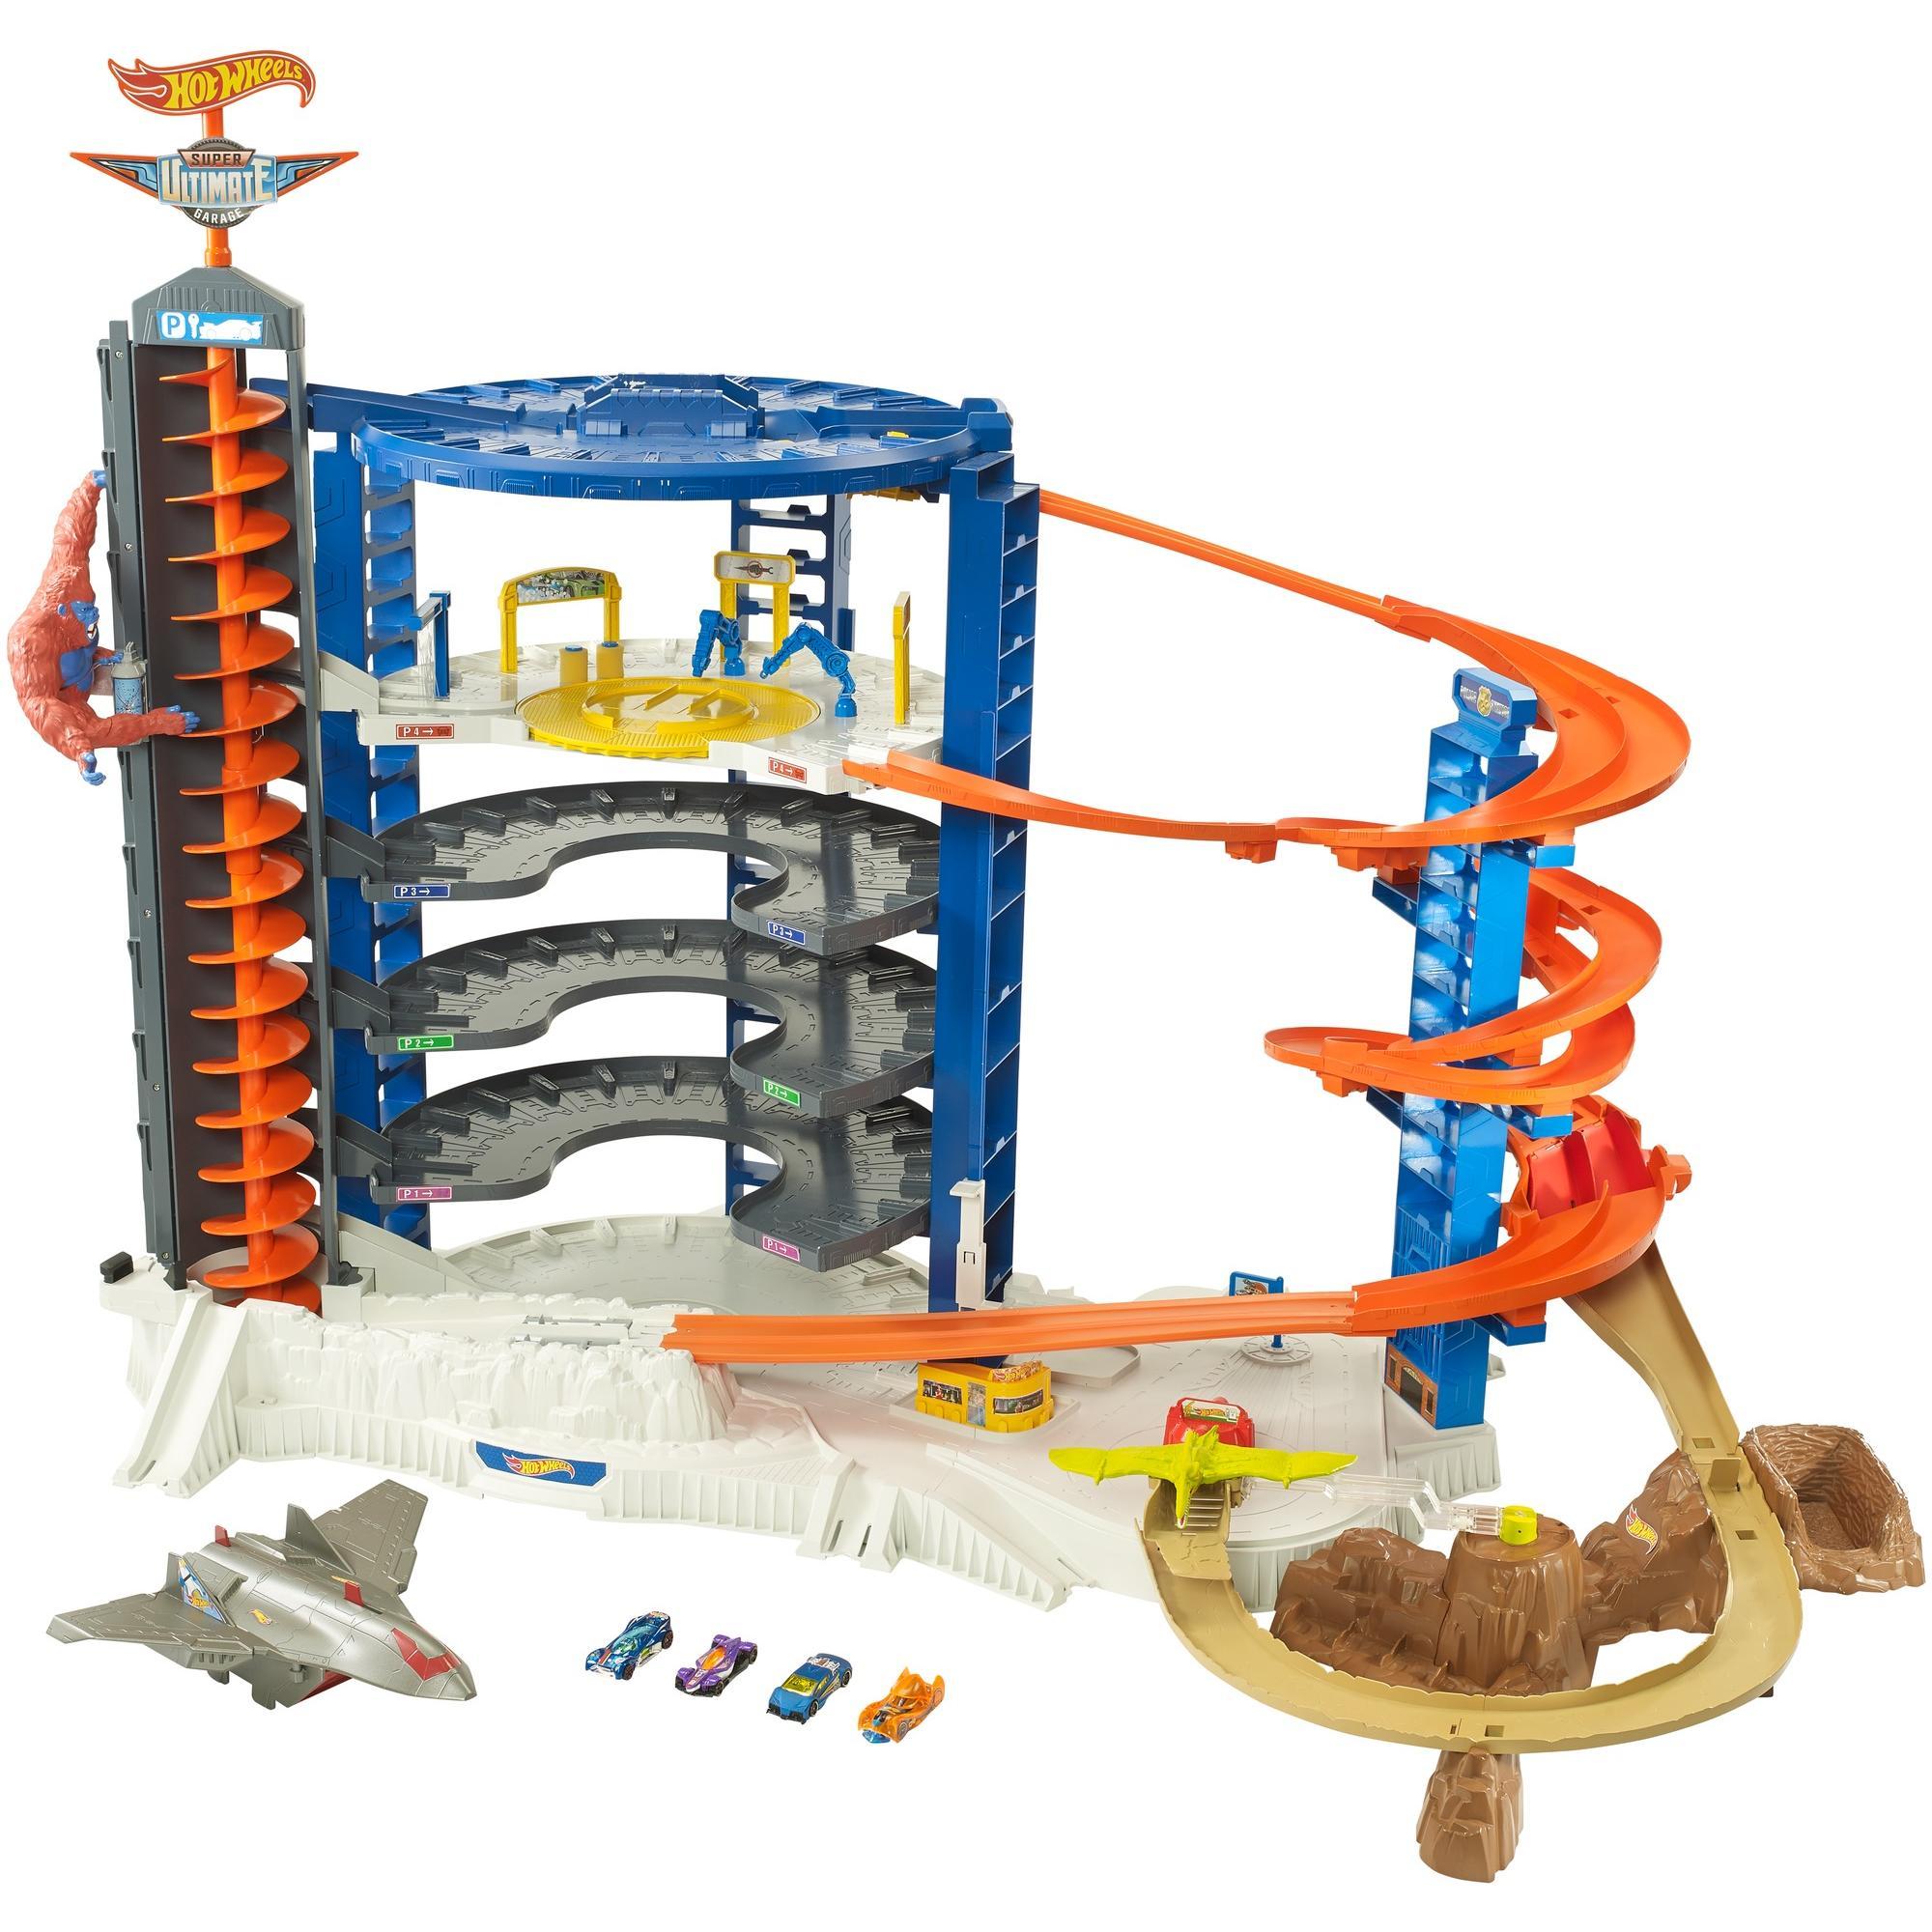 Hot Wheels Super Ultimate Garage Play Set + Accessories $140